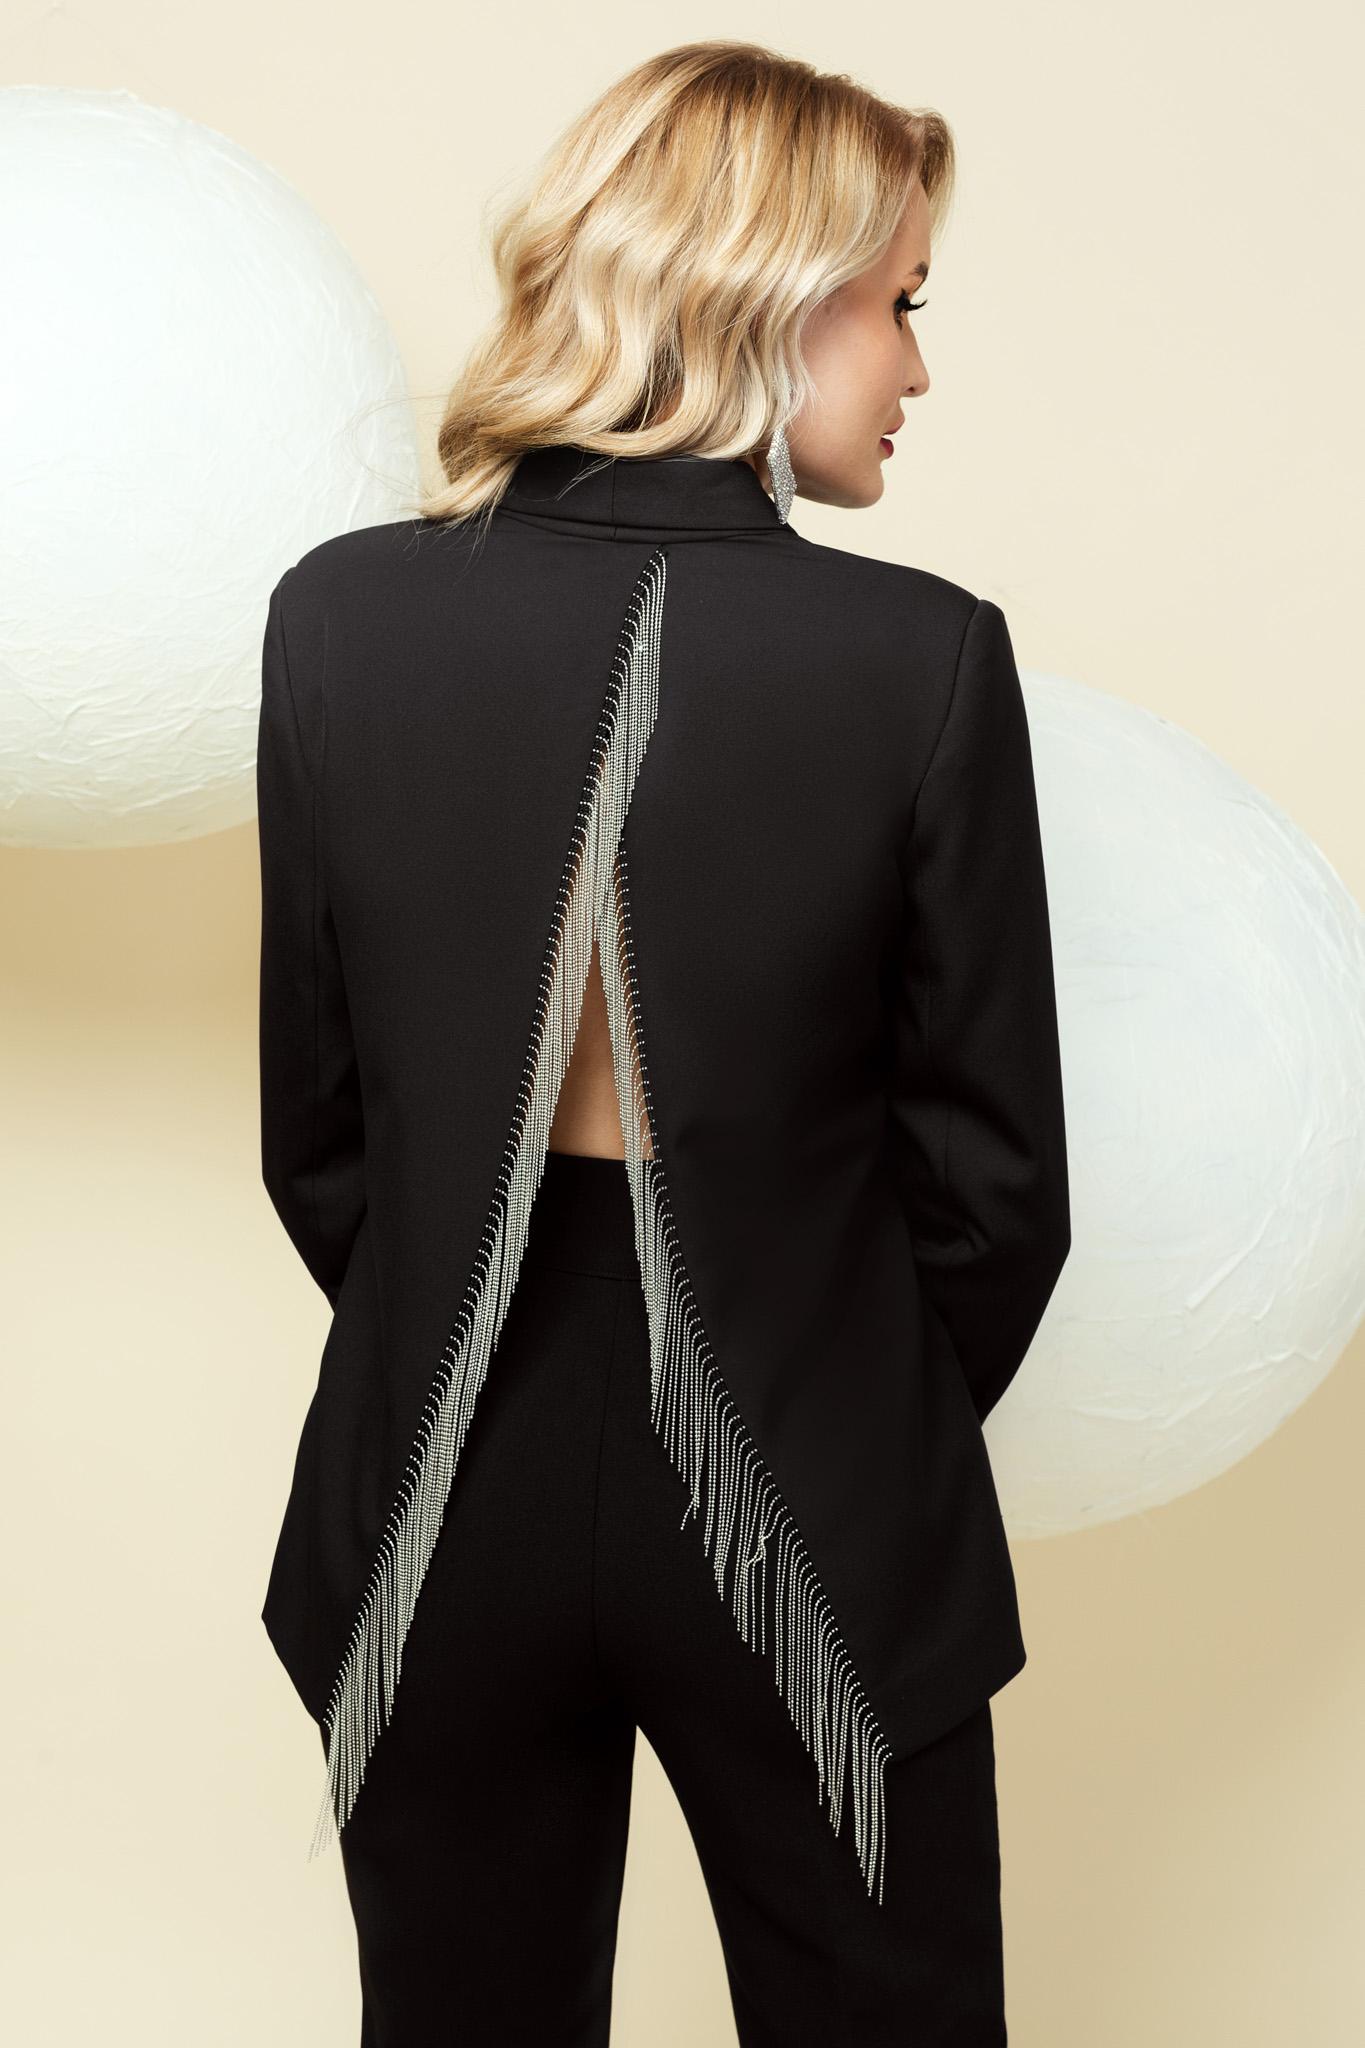 Cloth black jacket occasional straight with fringes back slit